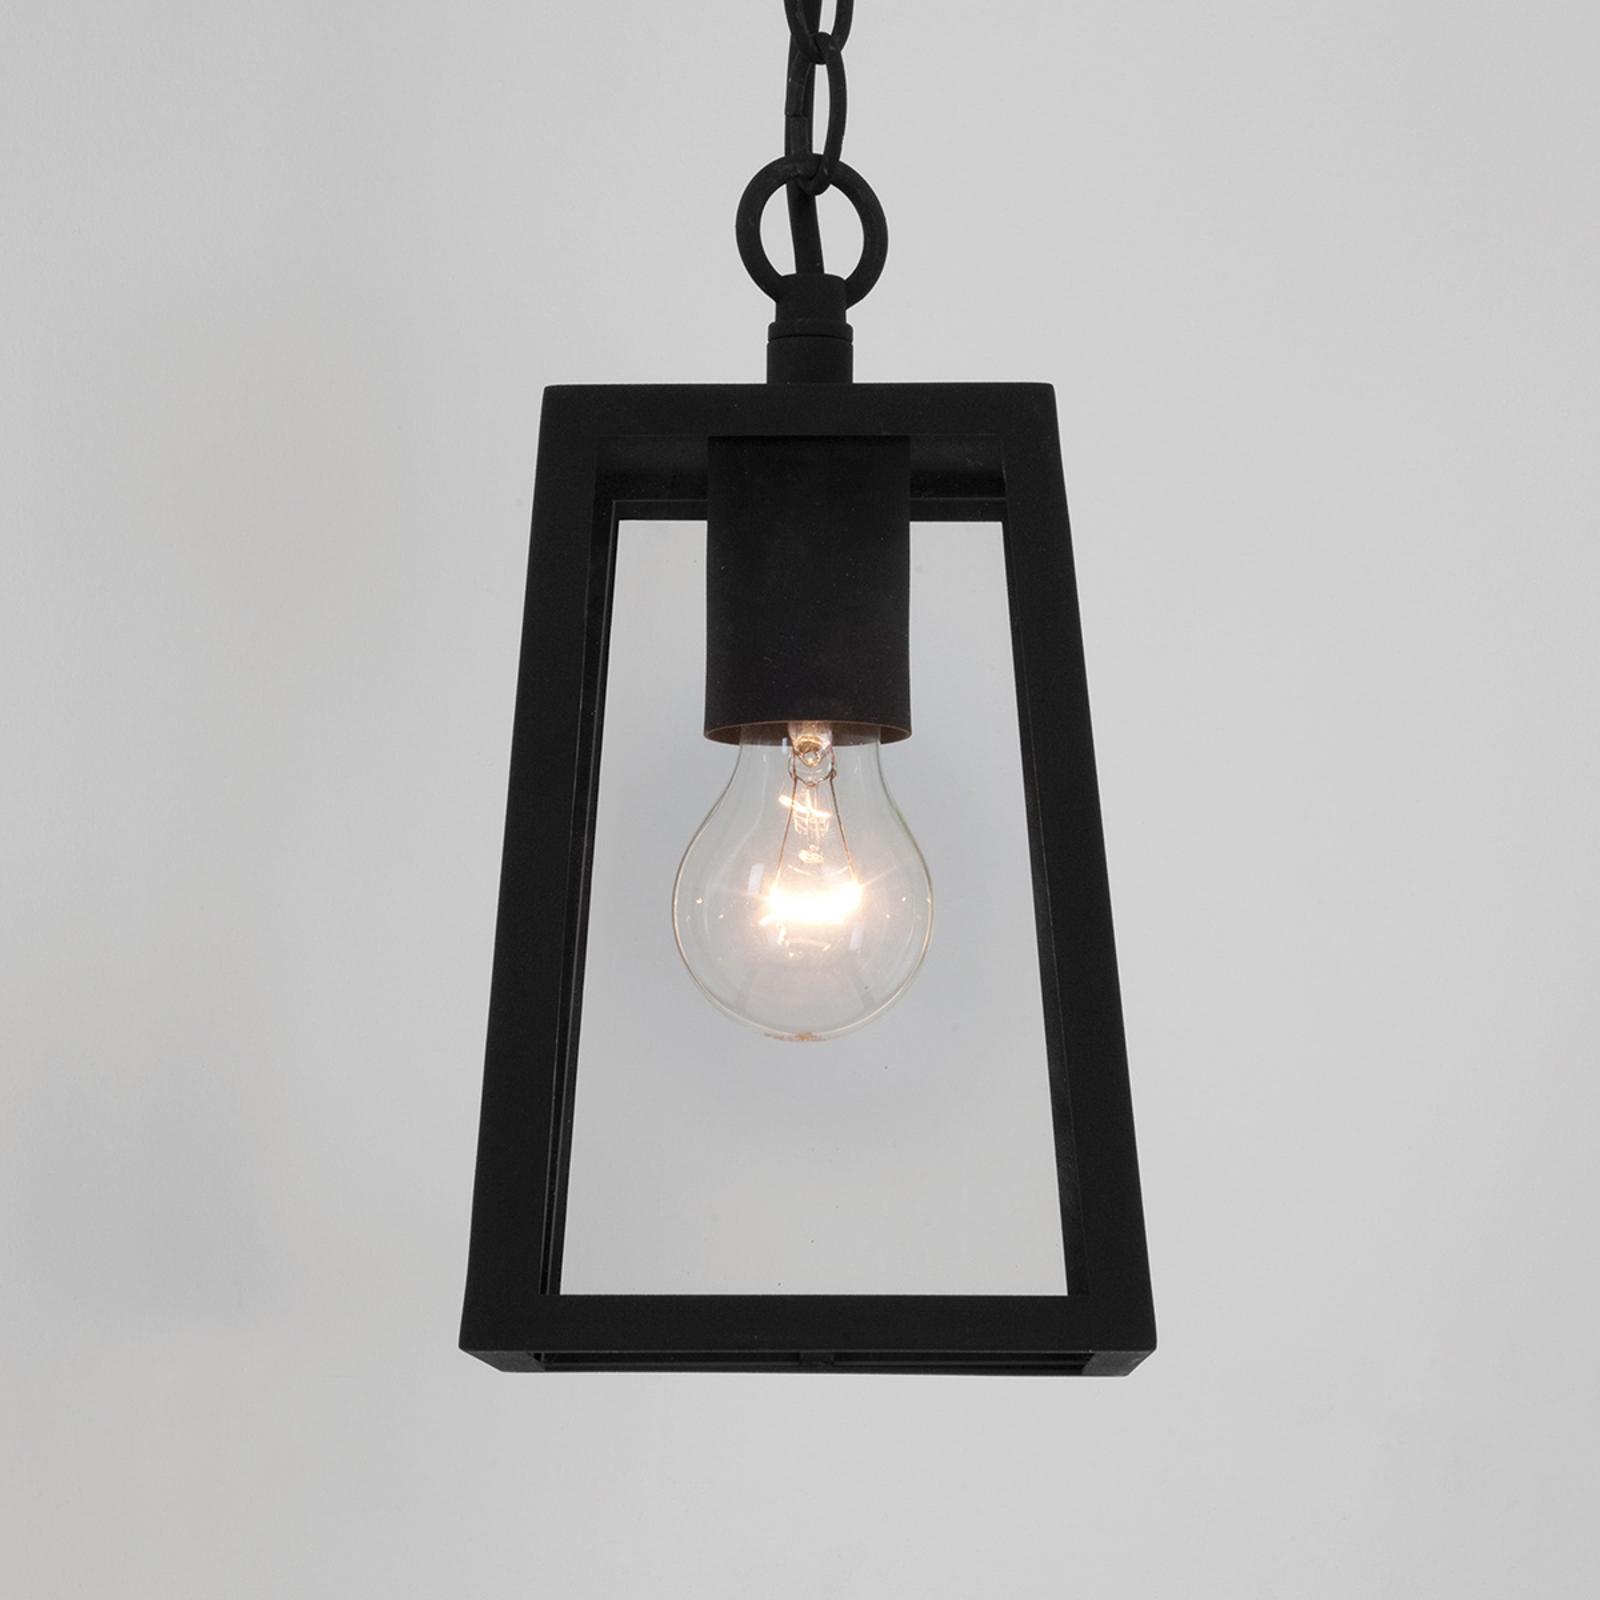 Lampa wisząca CALVI na zewn., czarna oprawa